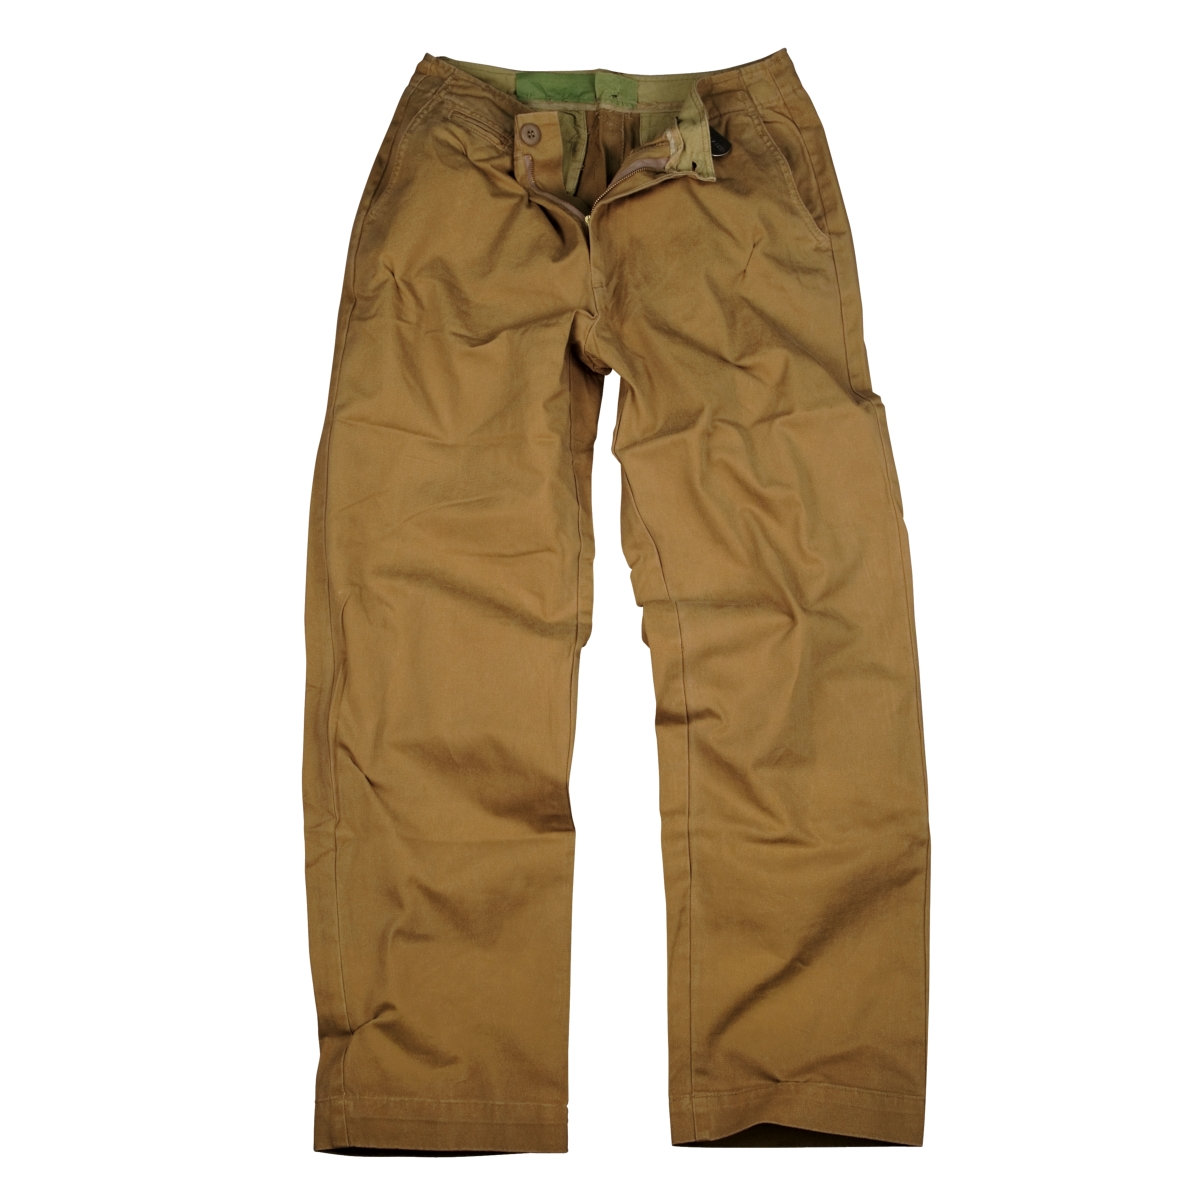 Rothco Vintage Chino Pants, Khaki at Sears.com